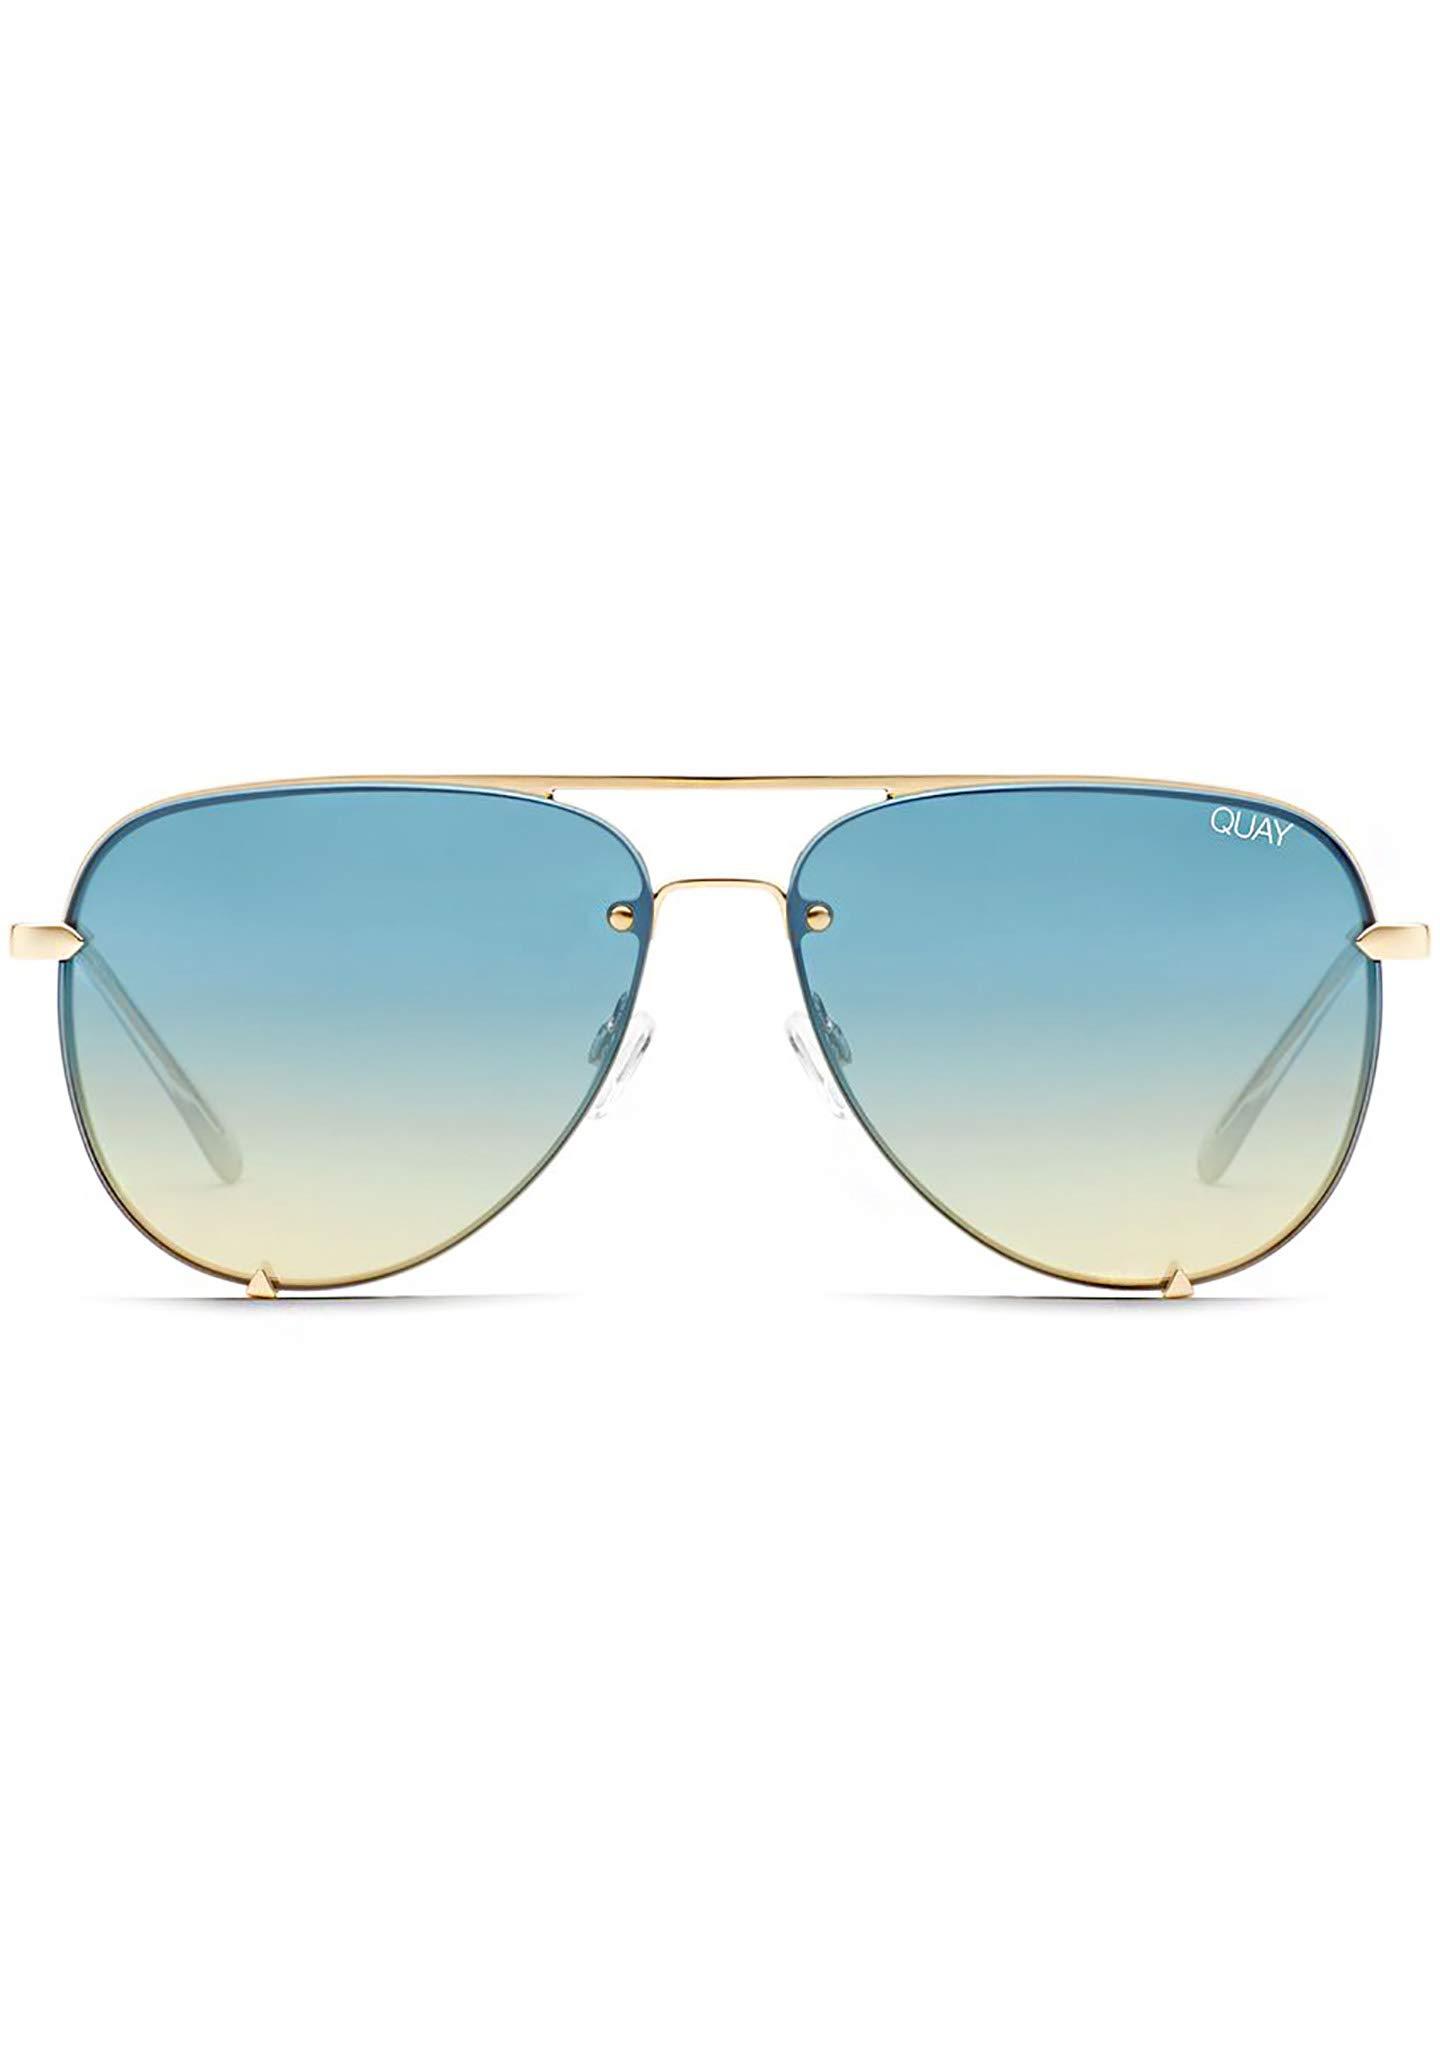 Quay Australia X Desi Perkins HIGH KEY RIMLESS Sunglasses in Gold Blue/Teal, Womens, One Size